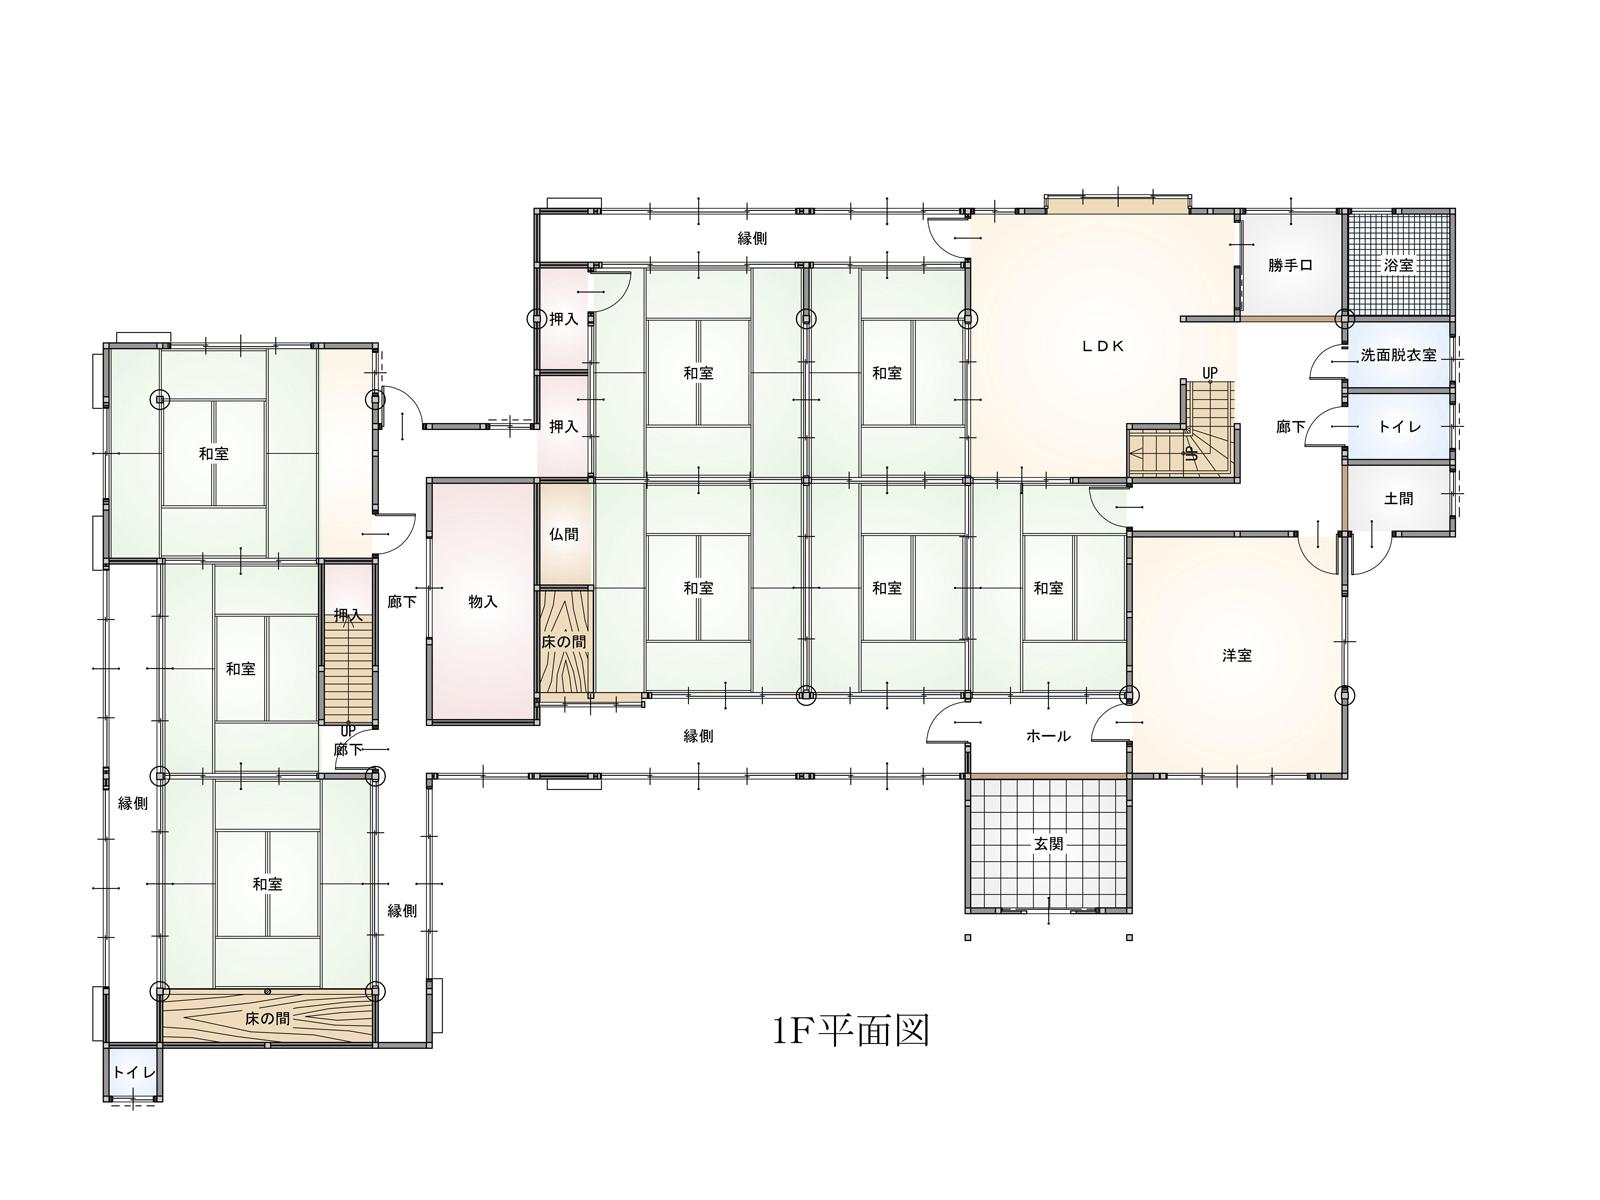 敏満寺物件平1F面図 © 株式会社丸由   建築/屋根工事業、宅建業、太陽光発電工事業を専門とする建設会社です